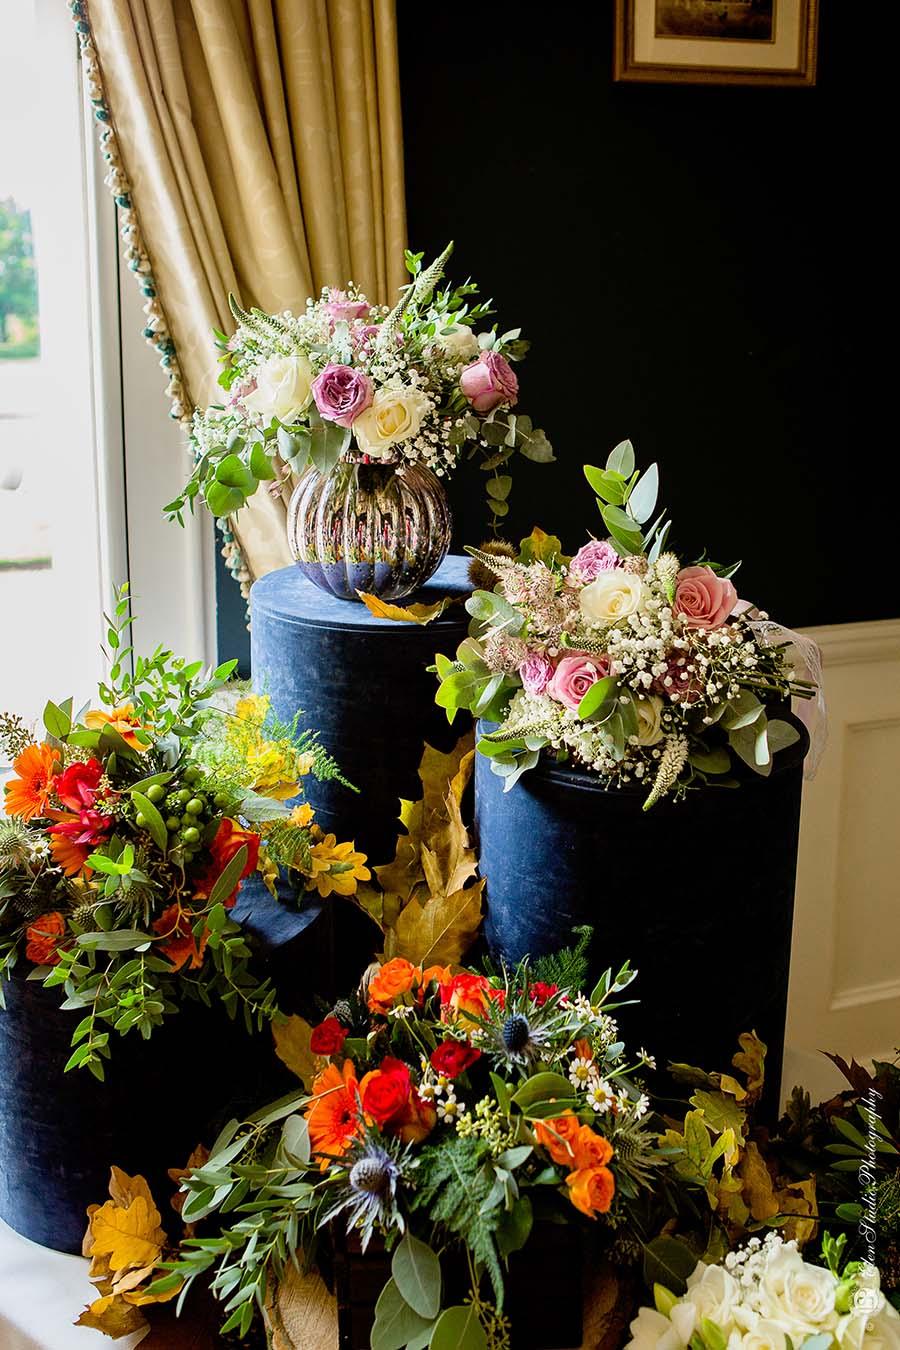 Hodsock-priory-wedding-fair-Elen-Studio-Photography-009